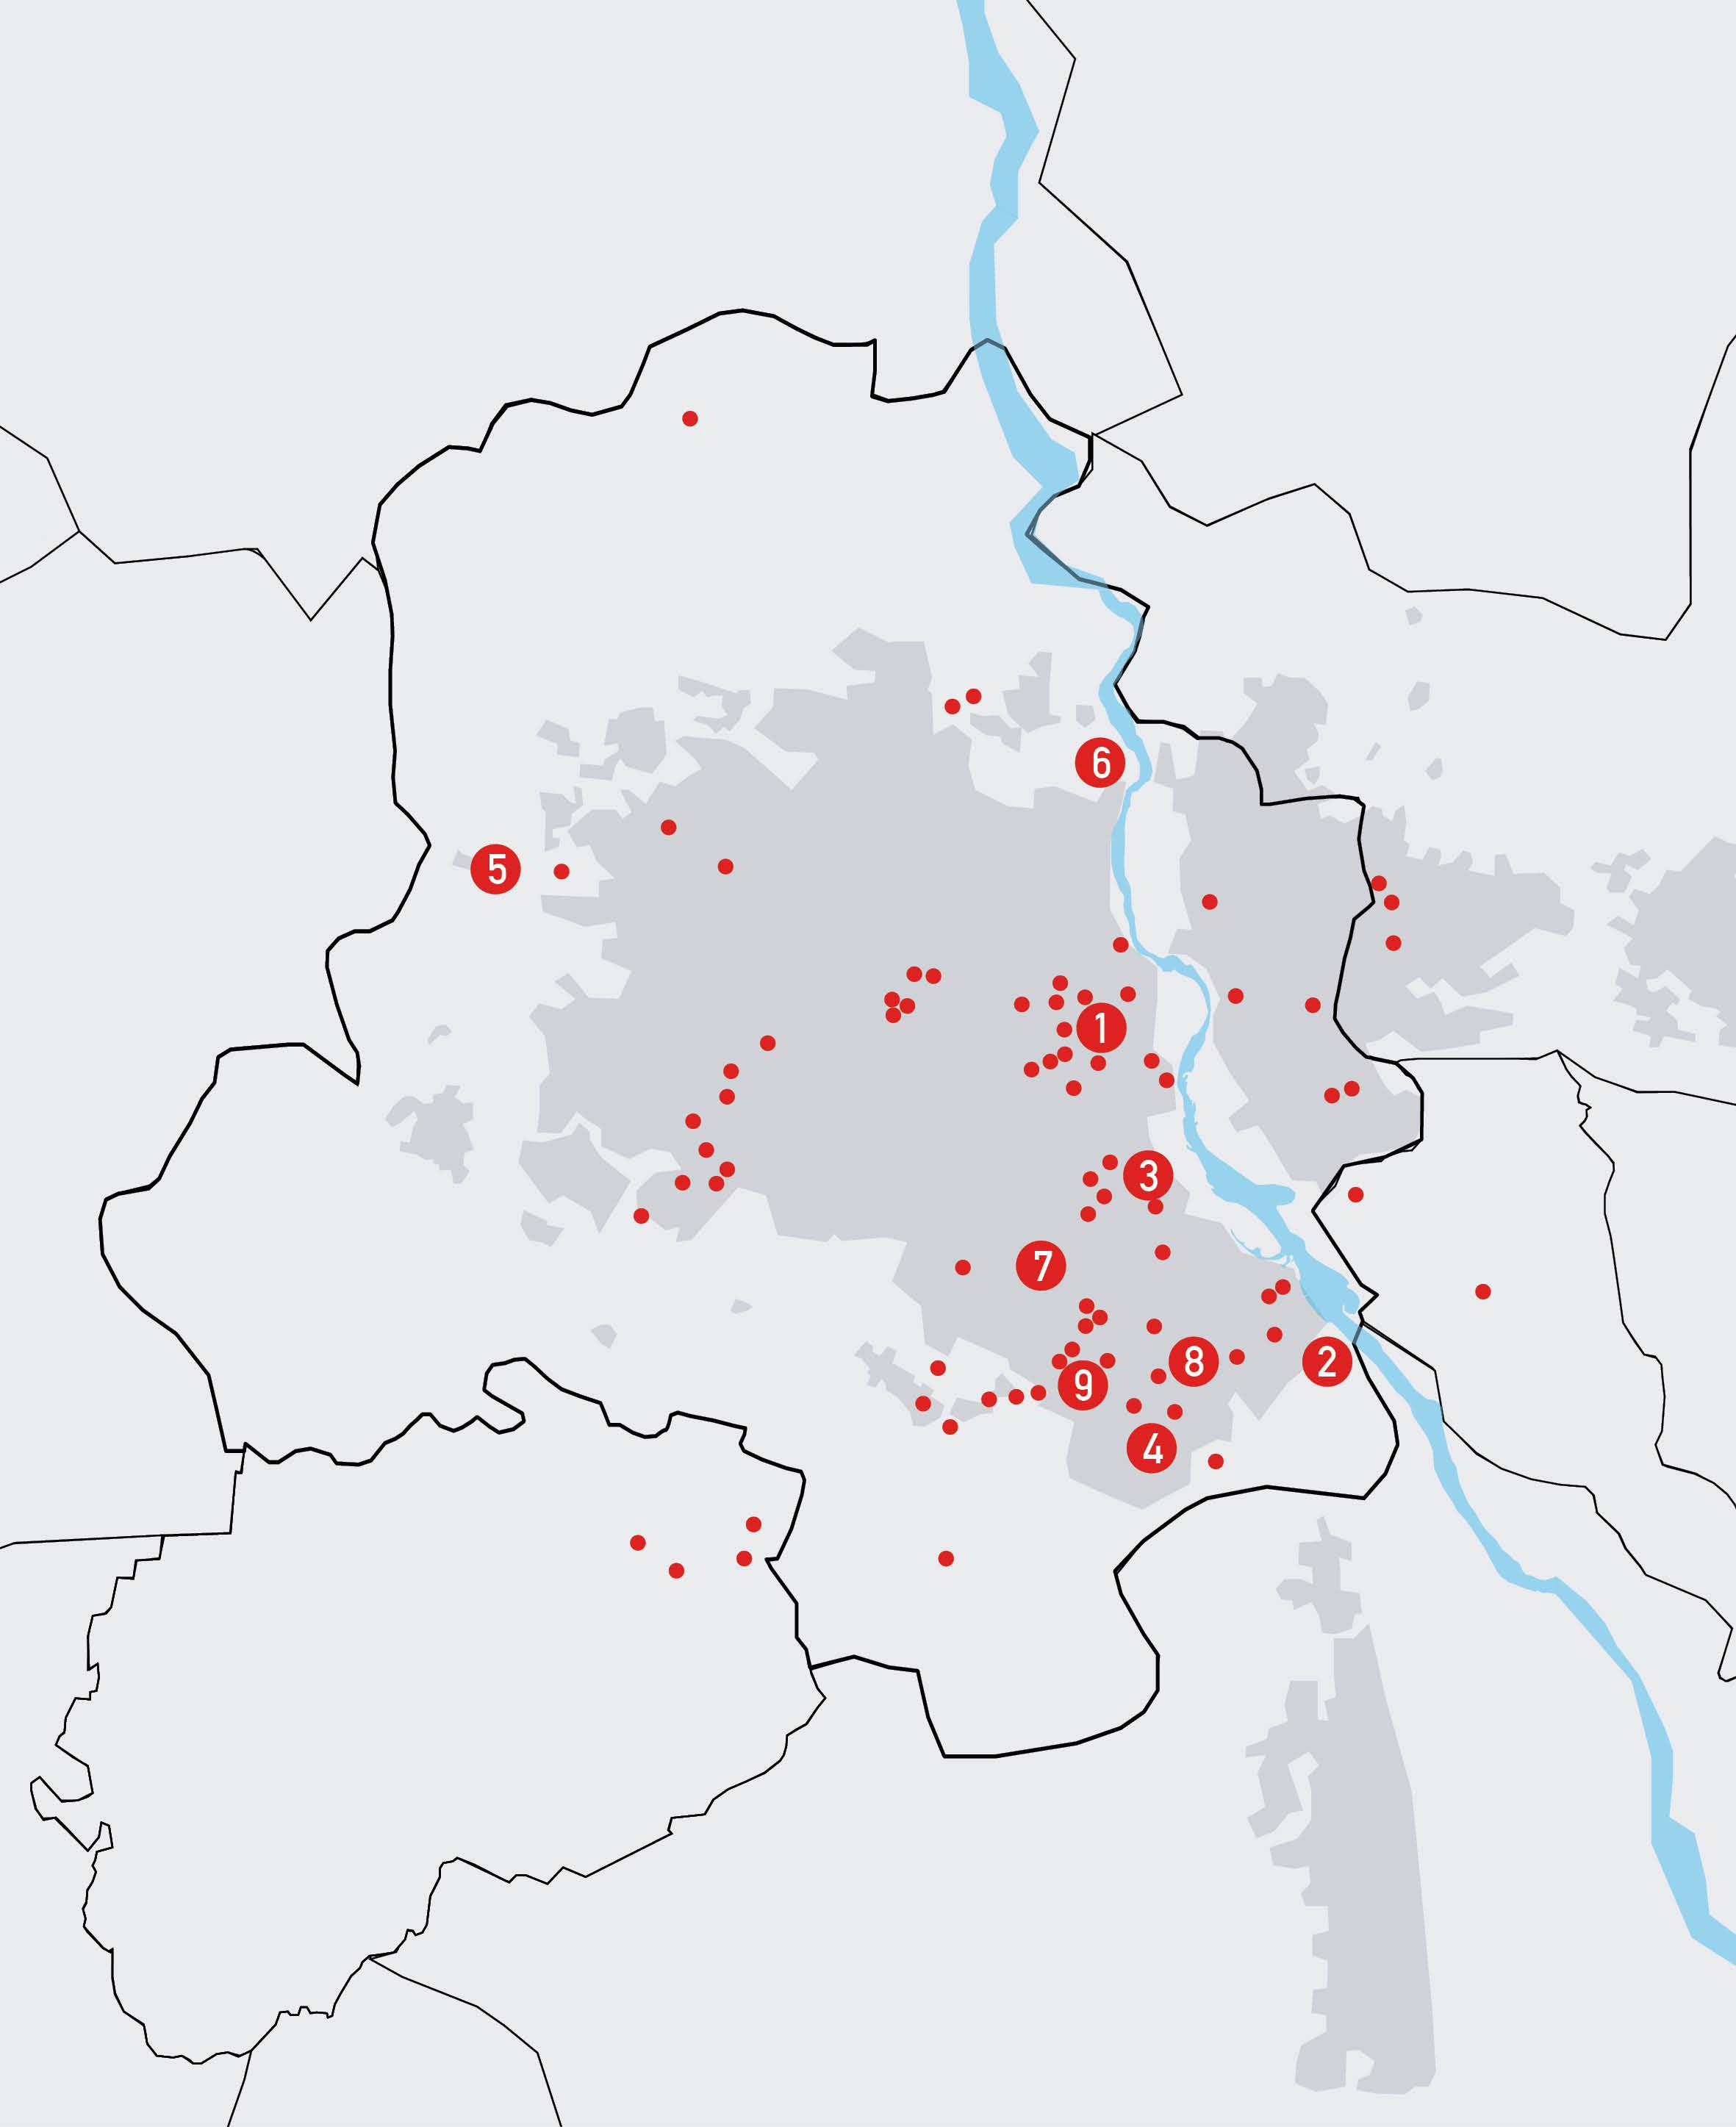 Delhi Mapping